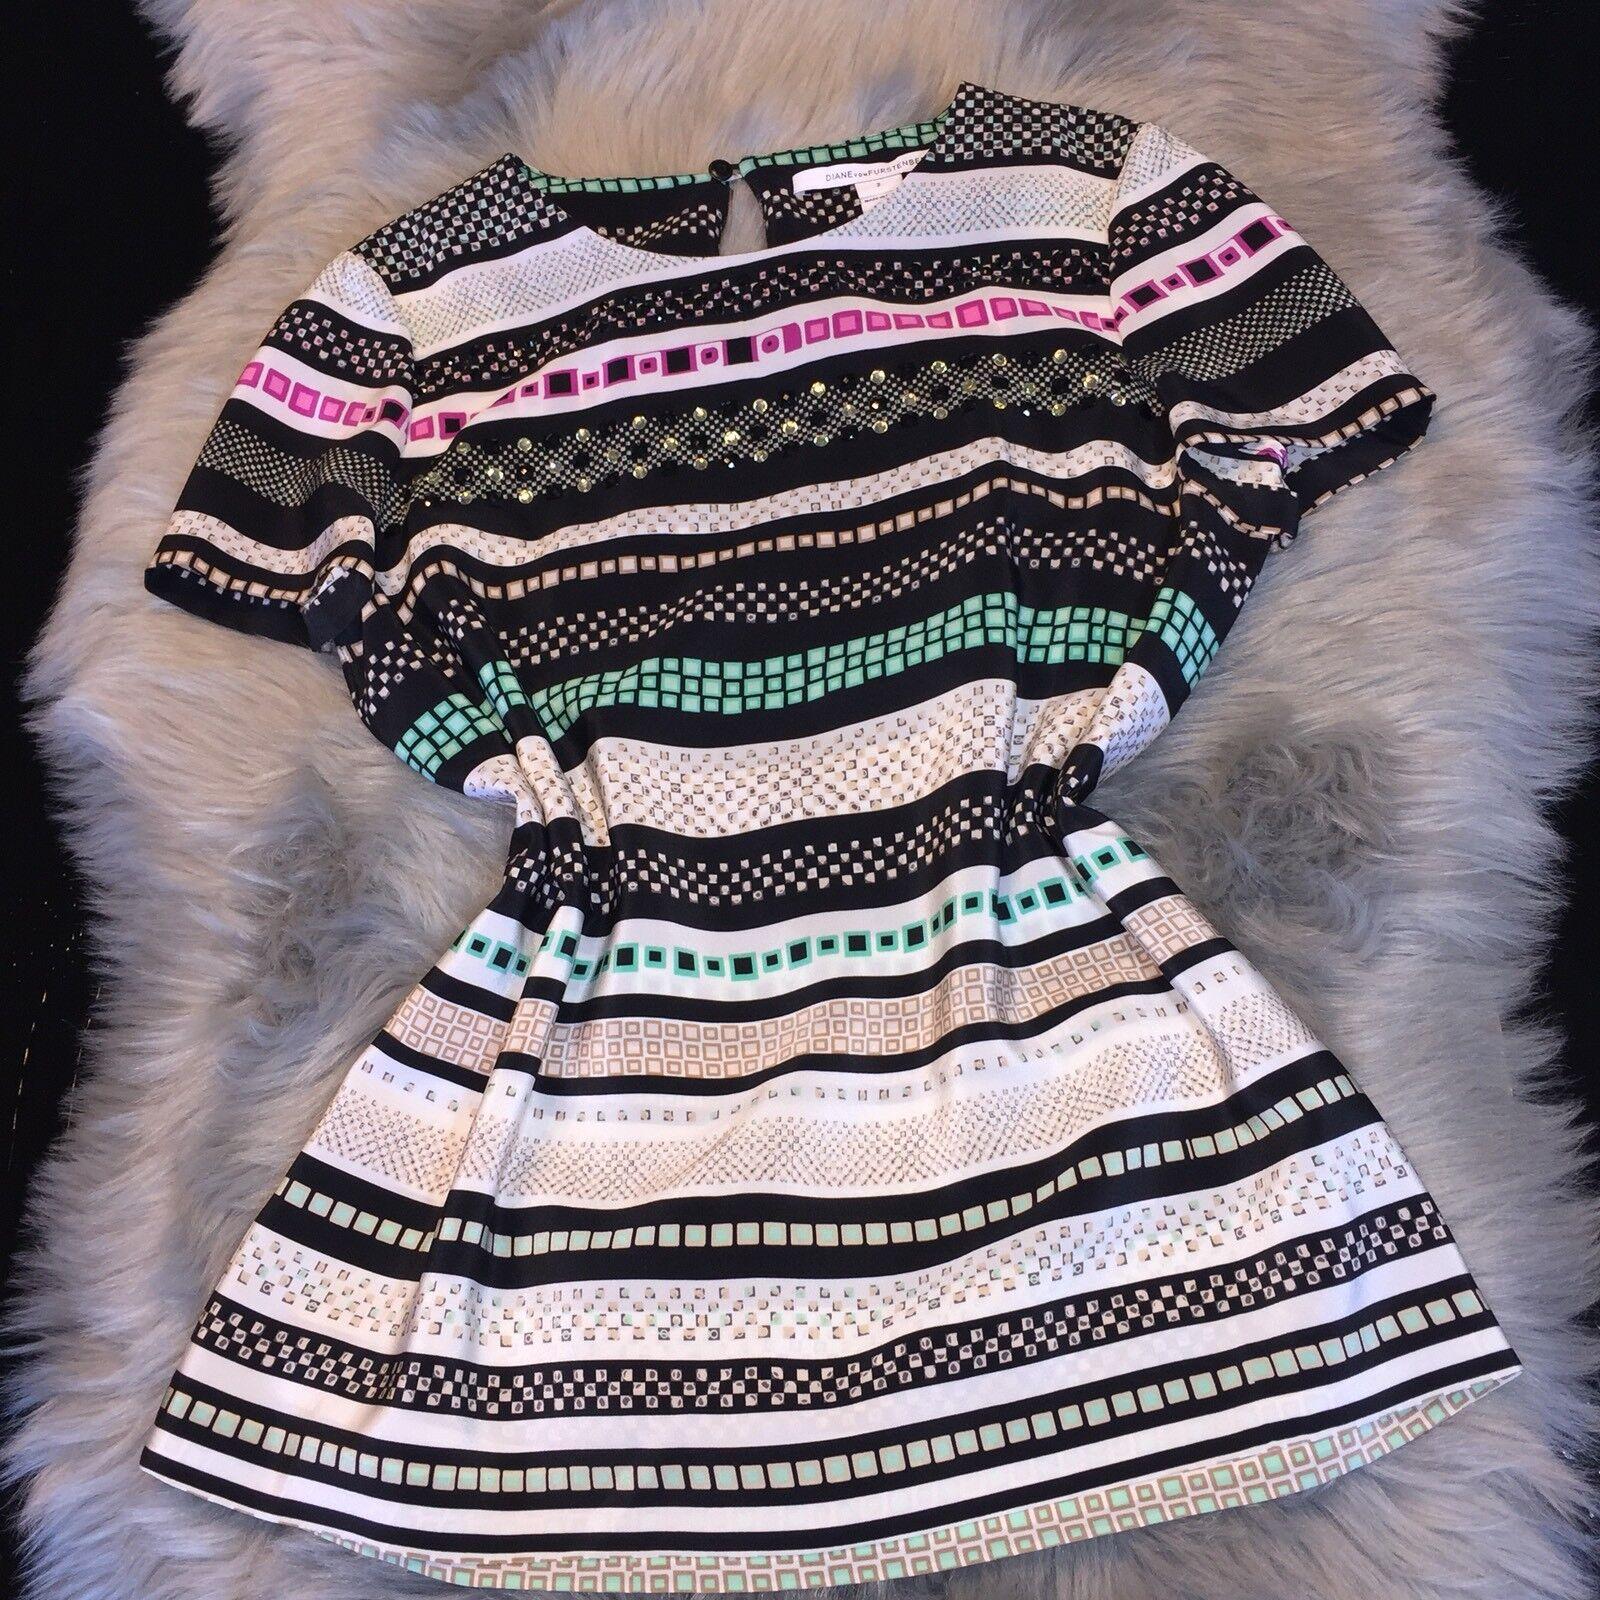 DVF Diane Von Furstenberg Multicolord Studded Silk Blouse Top Sz 2 NICE